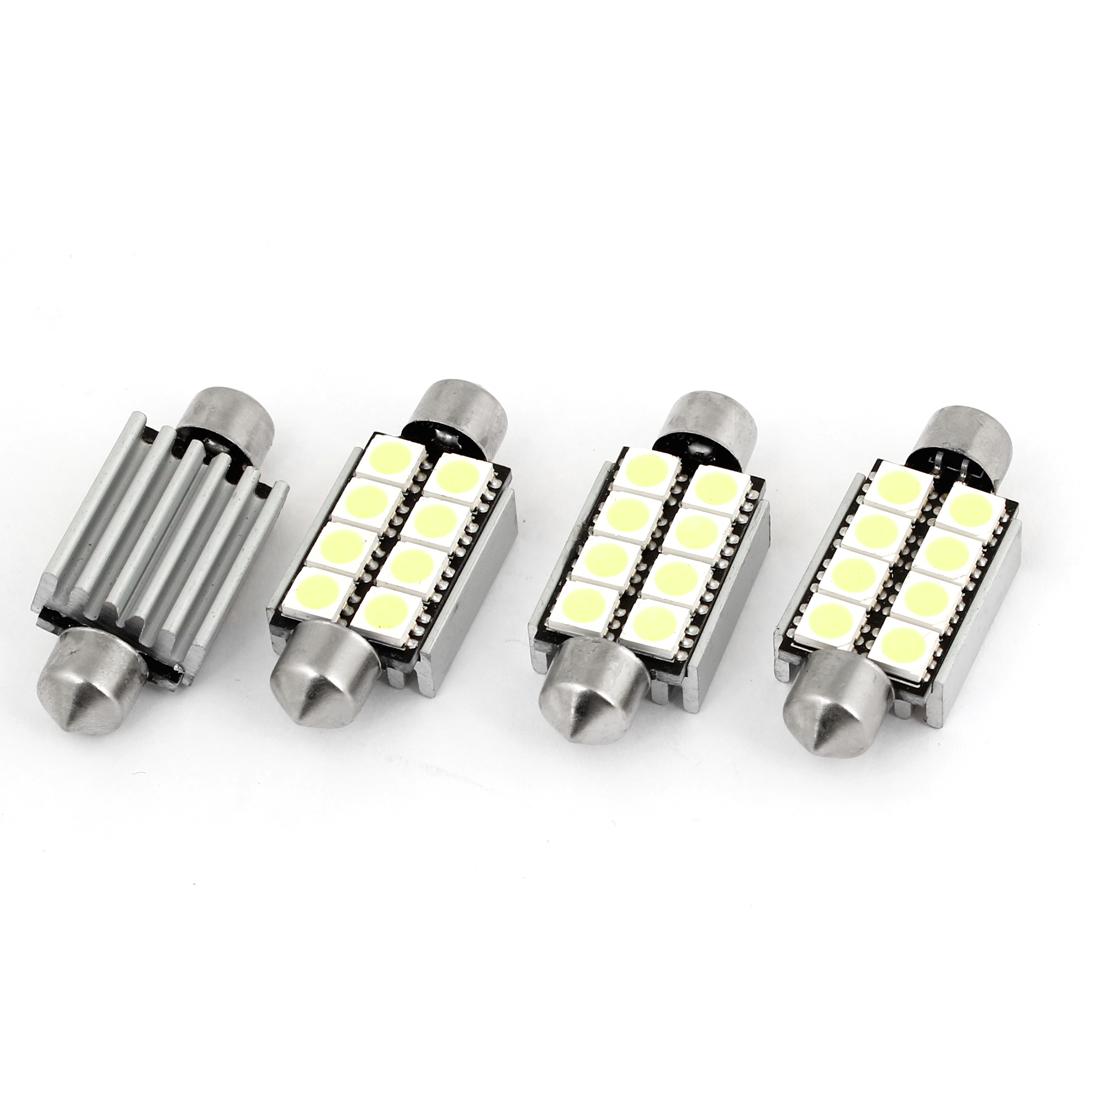 4pcs Car 8 White 5050 SMD LED Heat Sink Error Free Festoon Dome Map Light 41mm